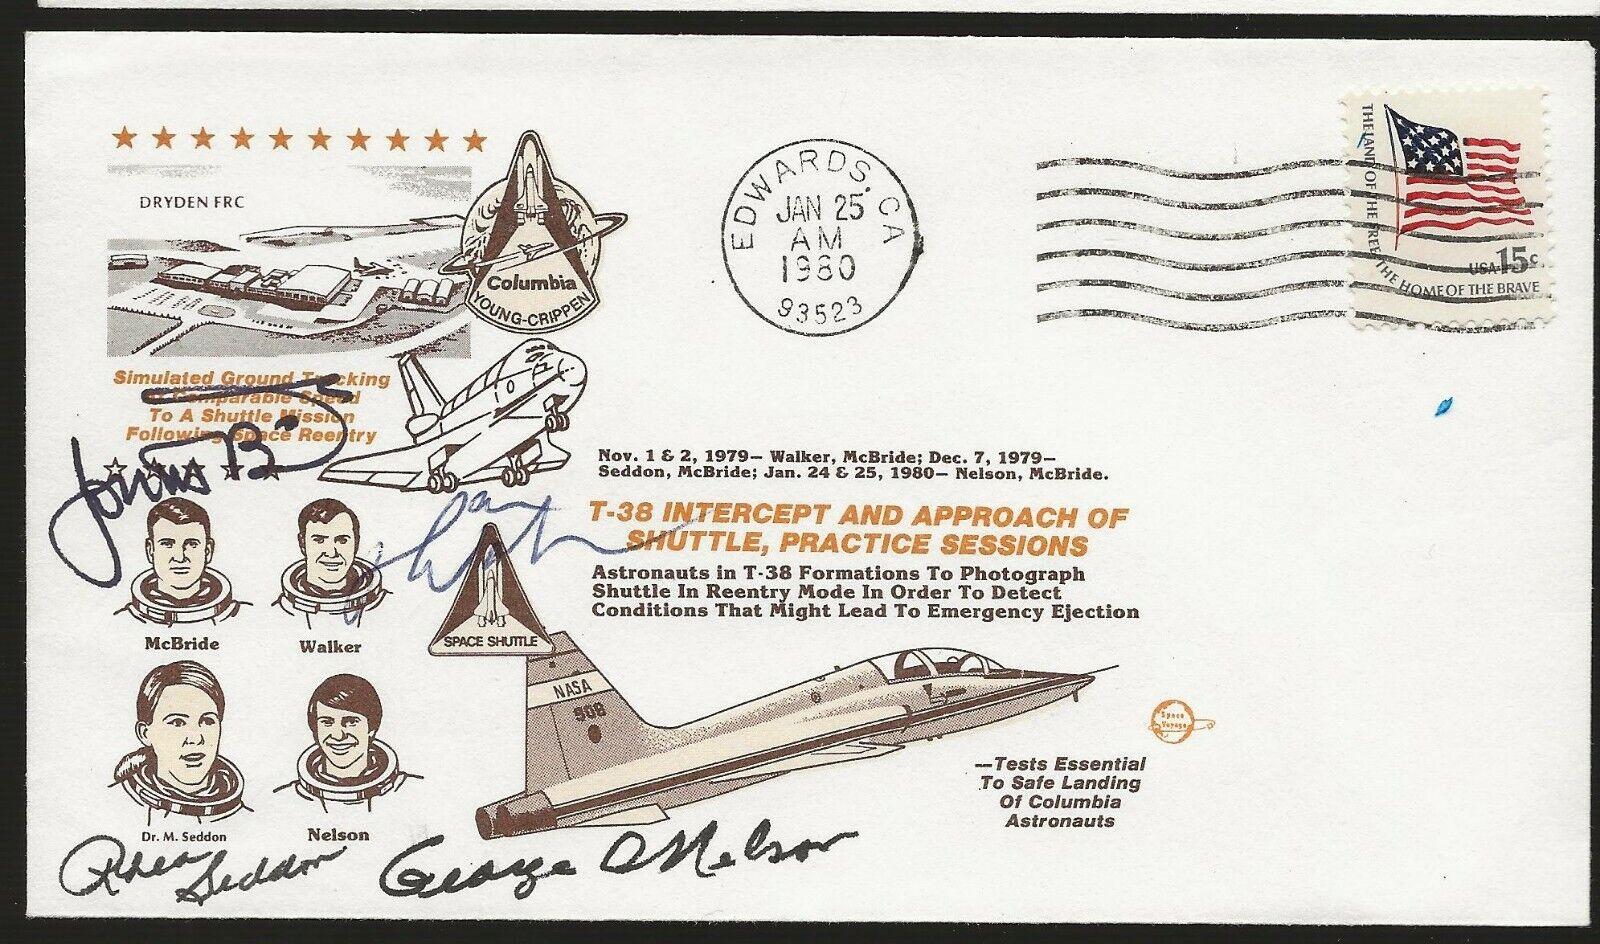 s l1600 - 1980 Flight T38's Shuttle Program, Autographed by 4 Astronauts, Hand Signed 2